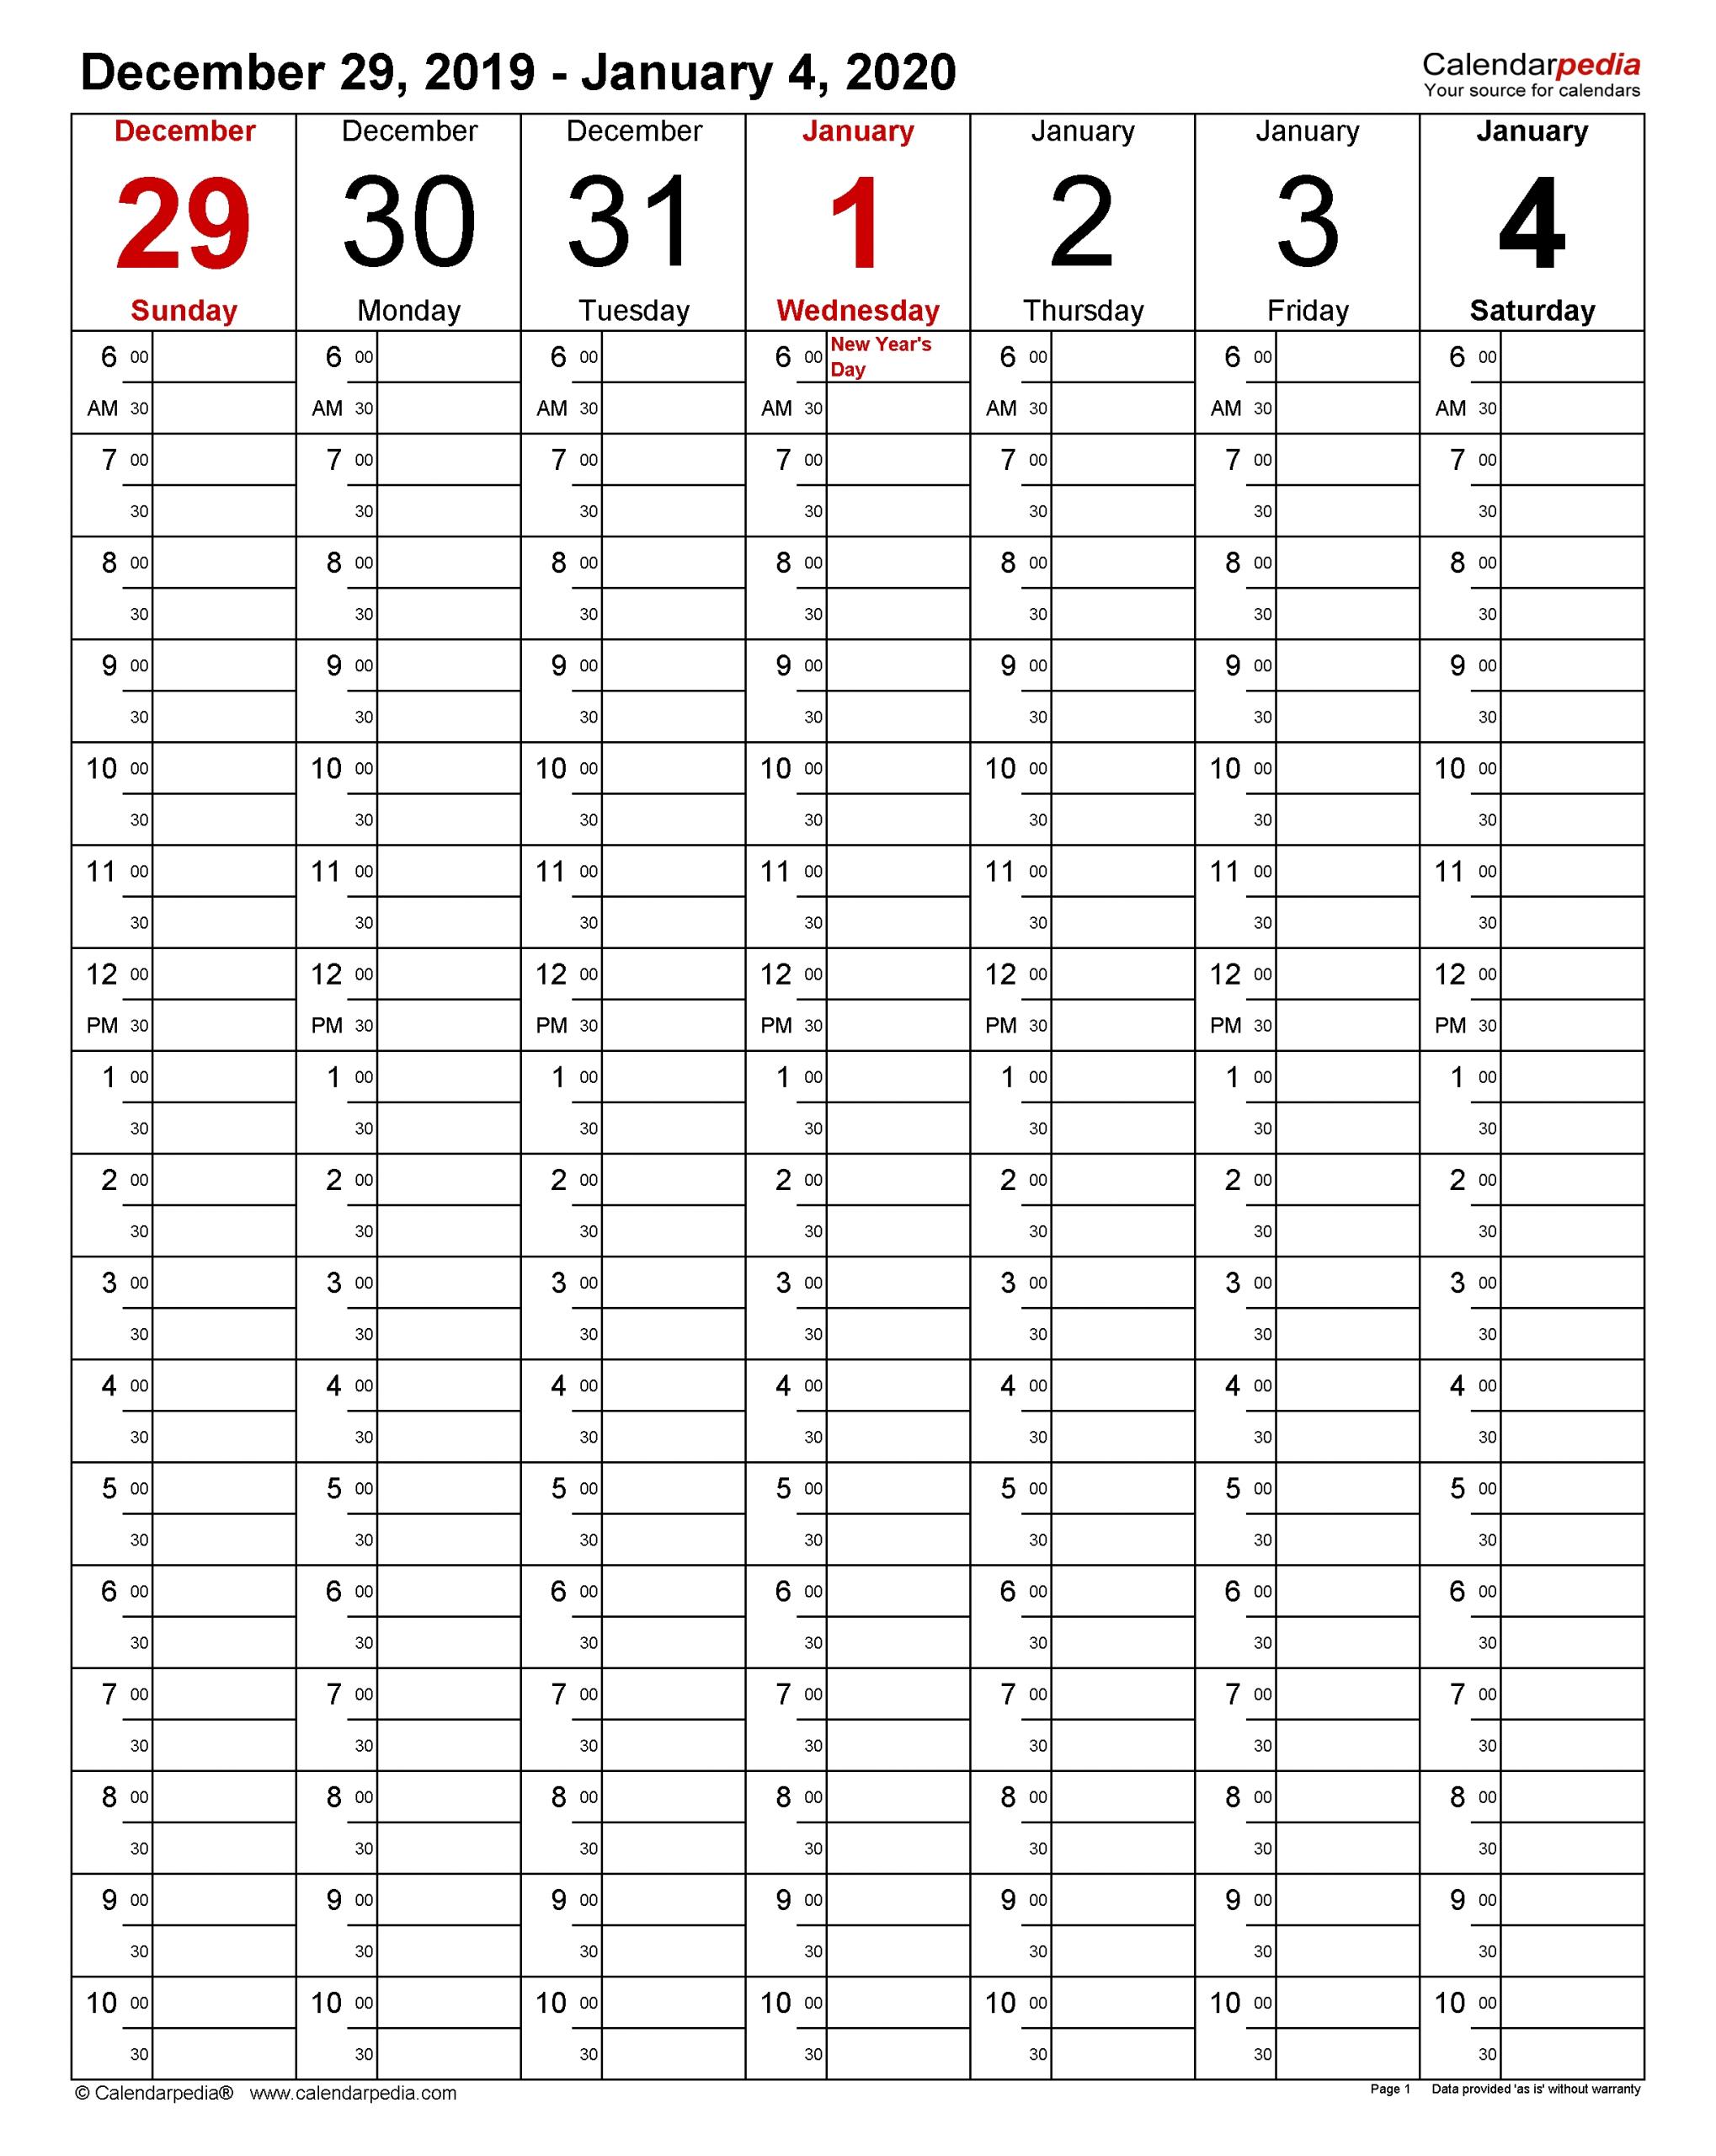 Weekly Calendars 2020 For Pdf - 12 Free Printable Templates inside 8.5 X 11 Free Printable Monthly Calendar 2020